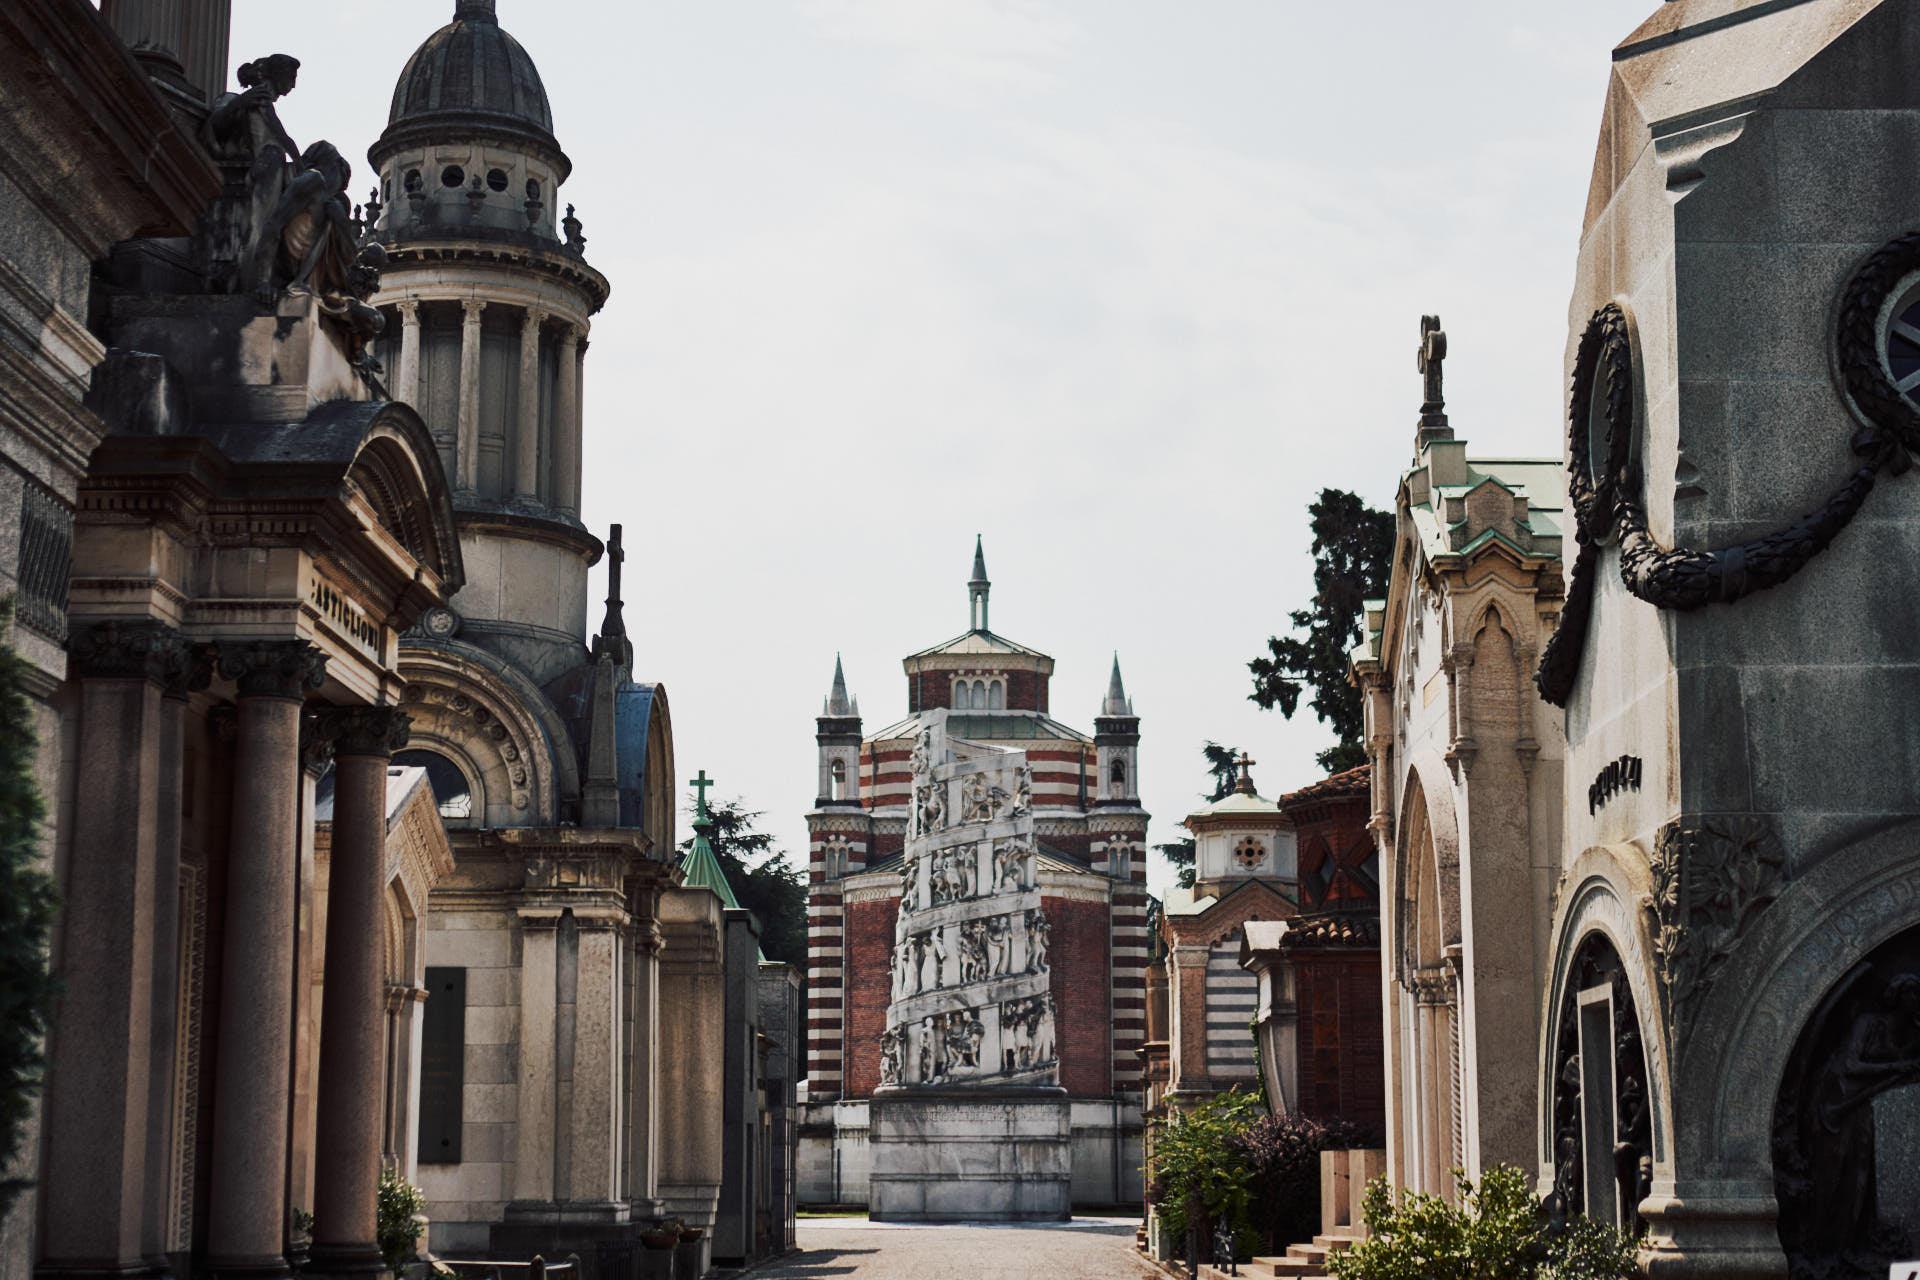 Cimiterio Monumentale - Milán - José Álvarez Fotografía